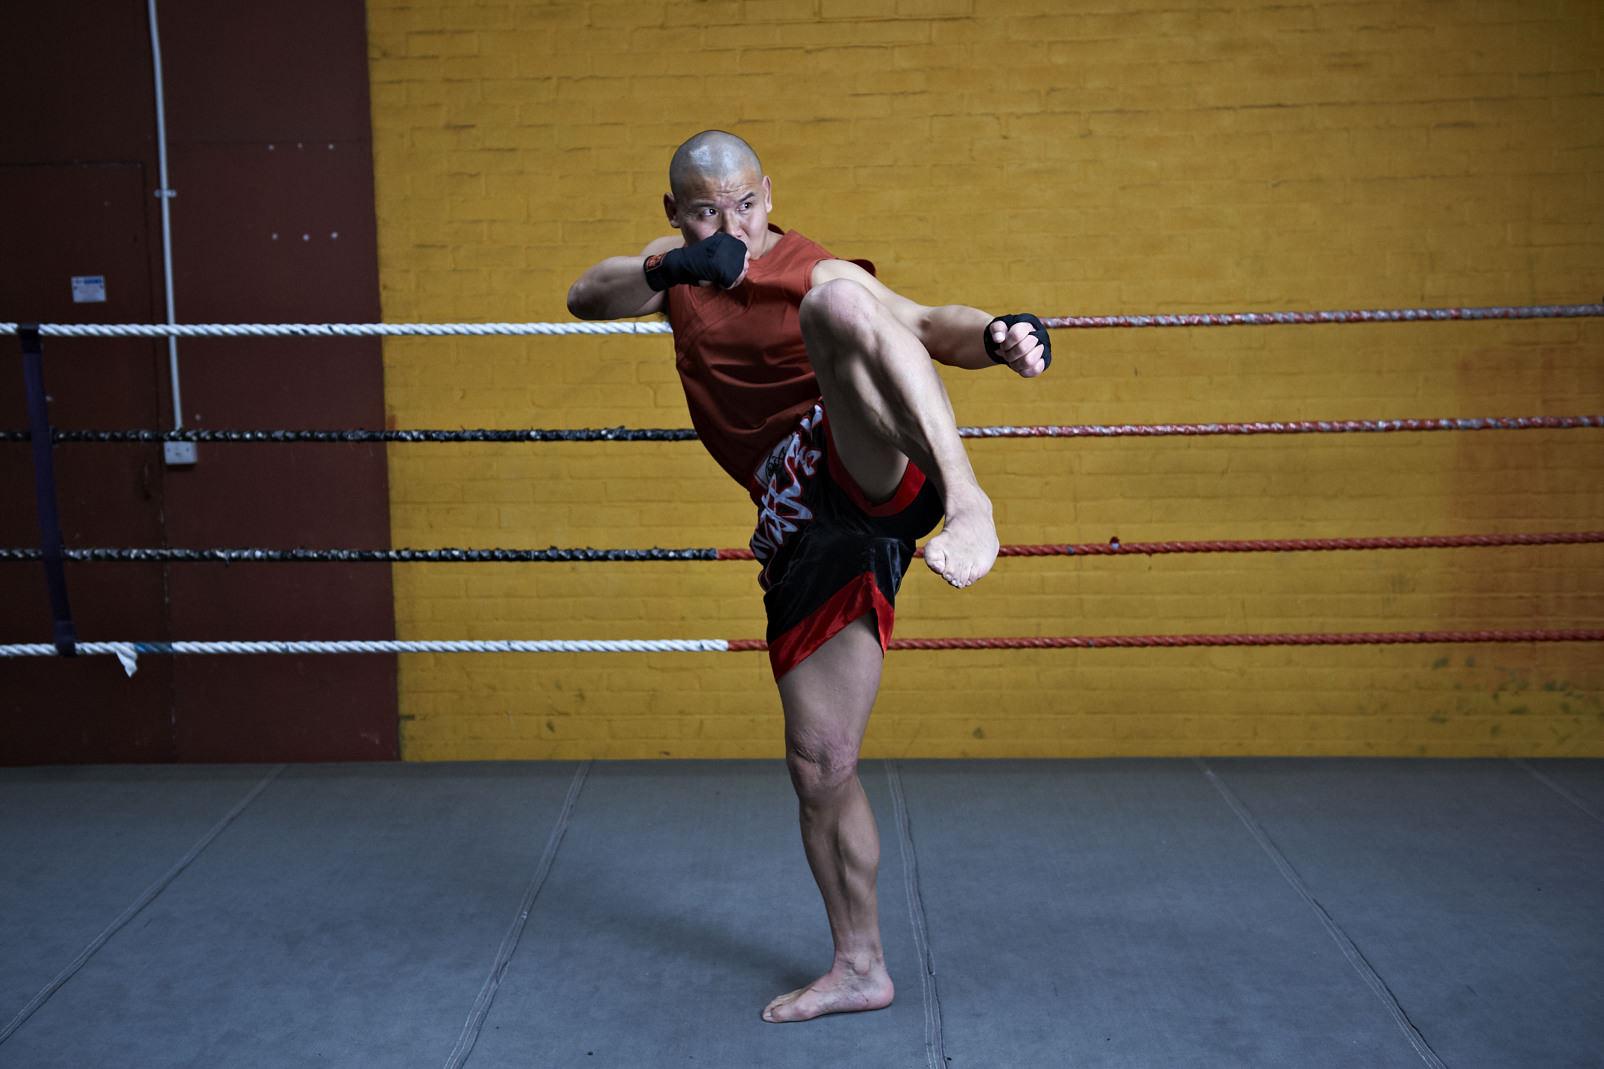 Shaolin temple uk shifu yanzi kick 31.jpg